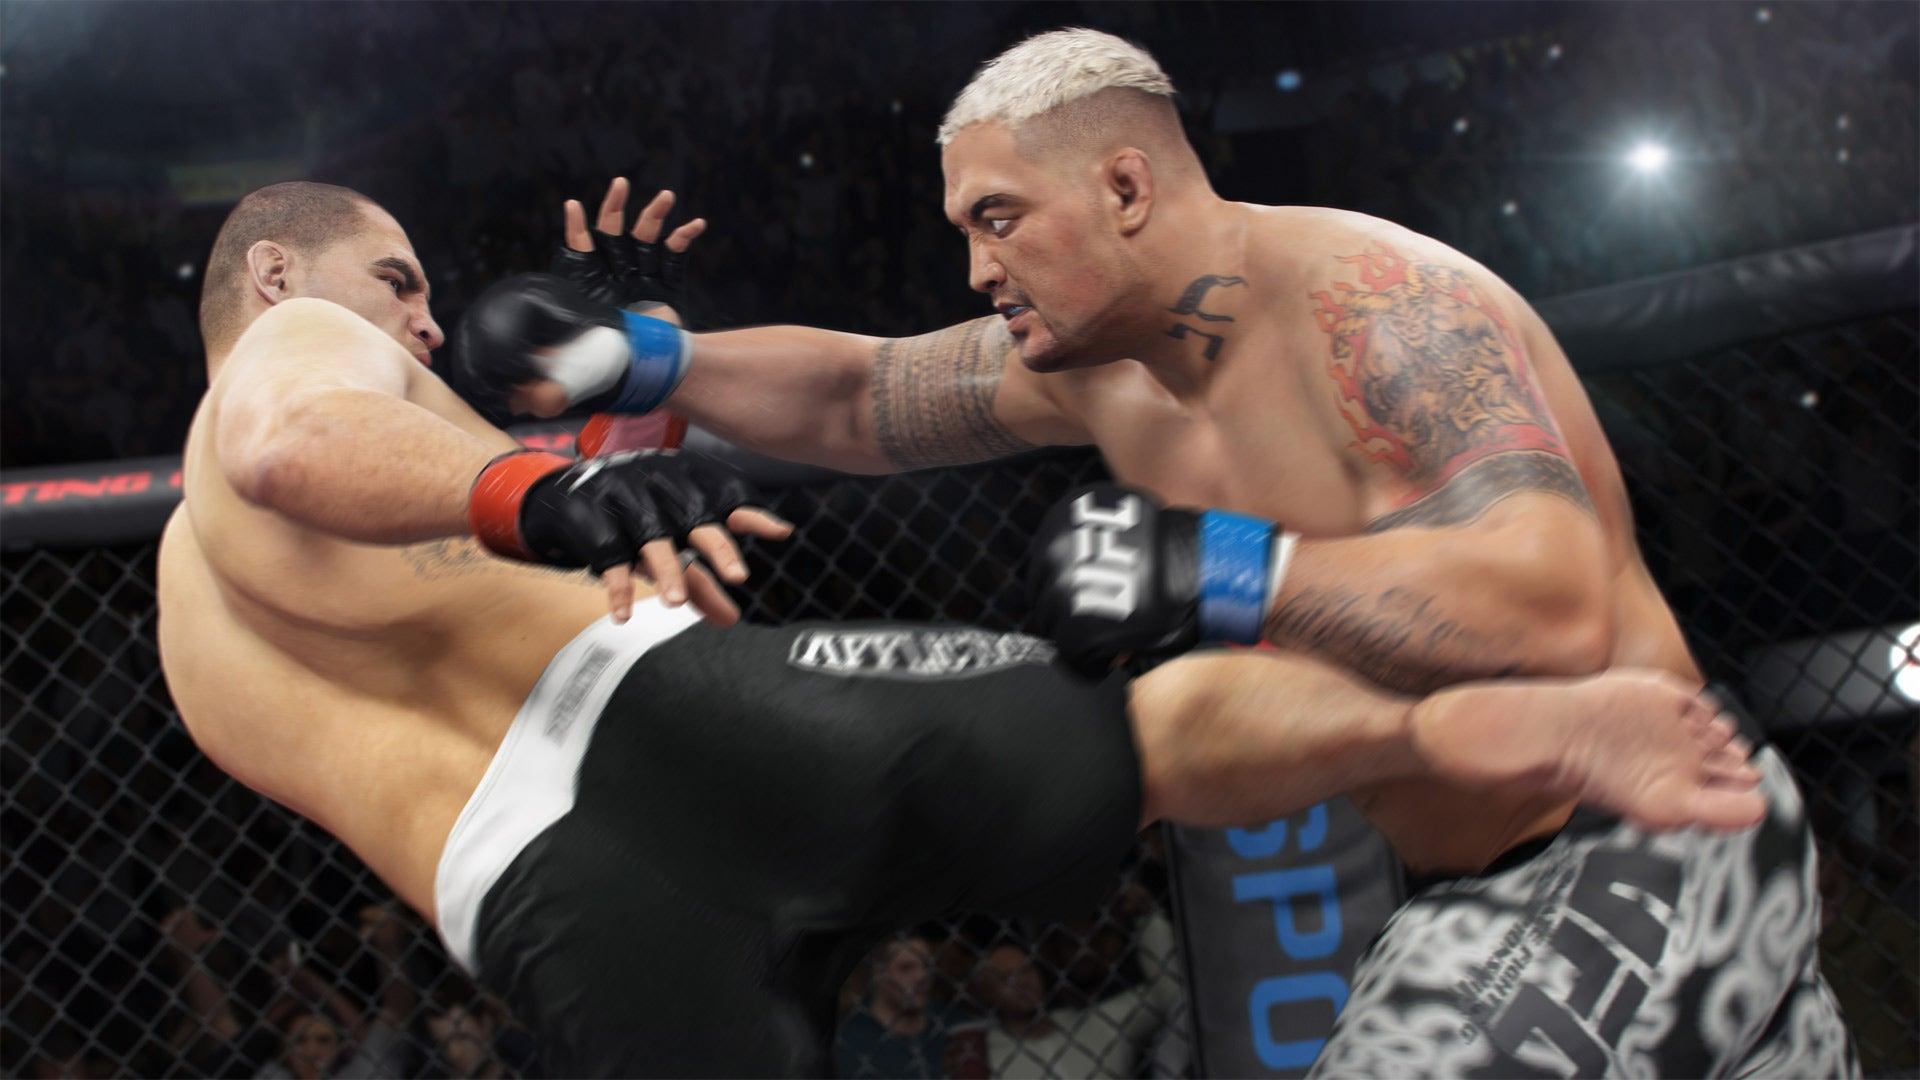 UFC 3 preview, release date, trailers, pre-order bonus ...